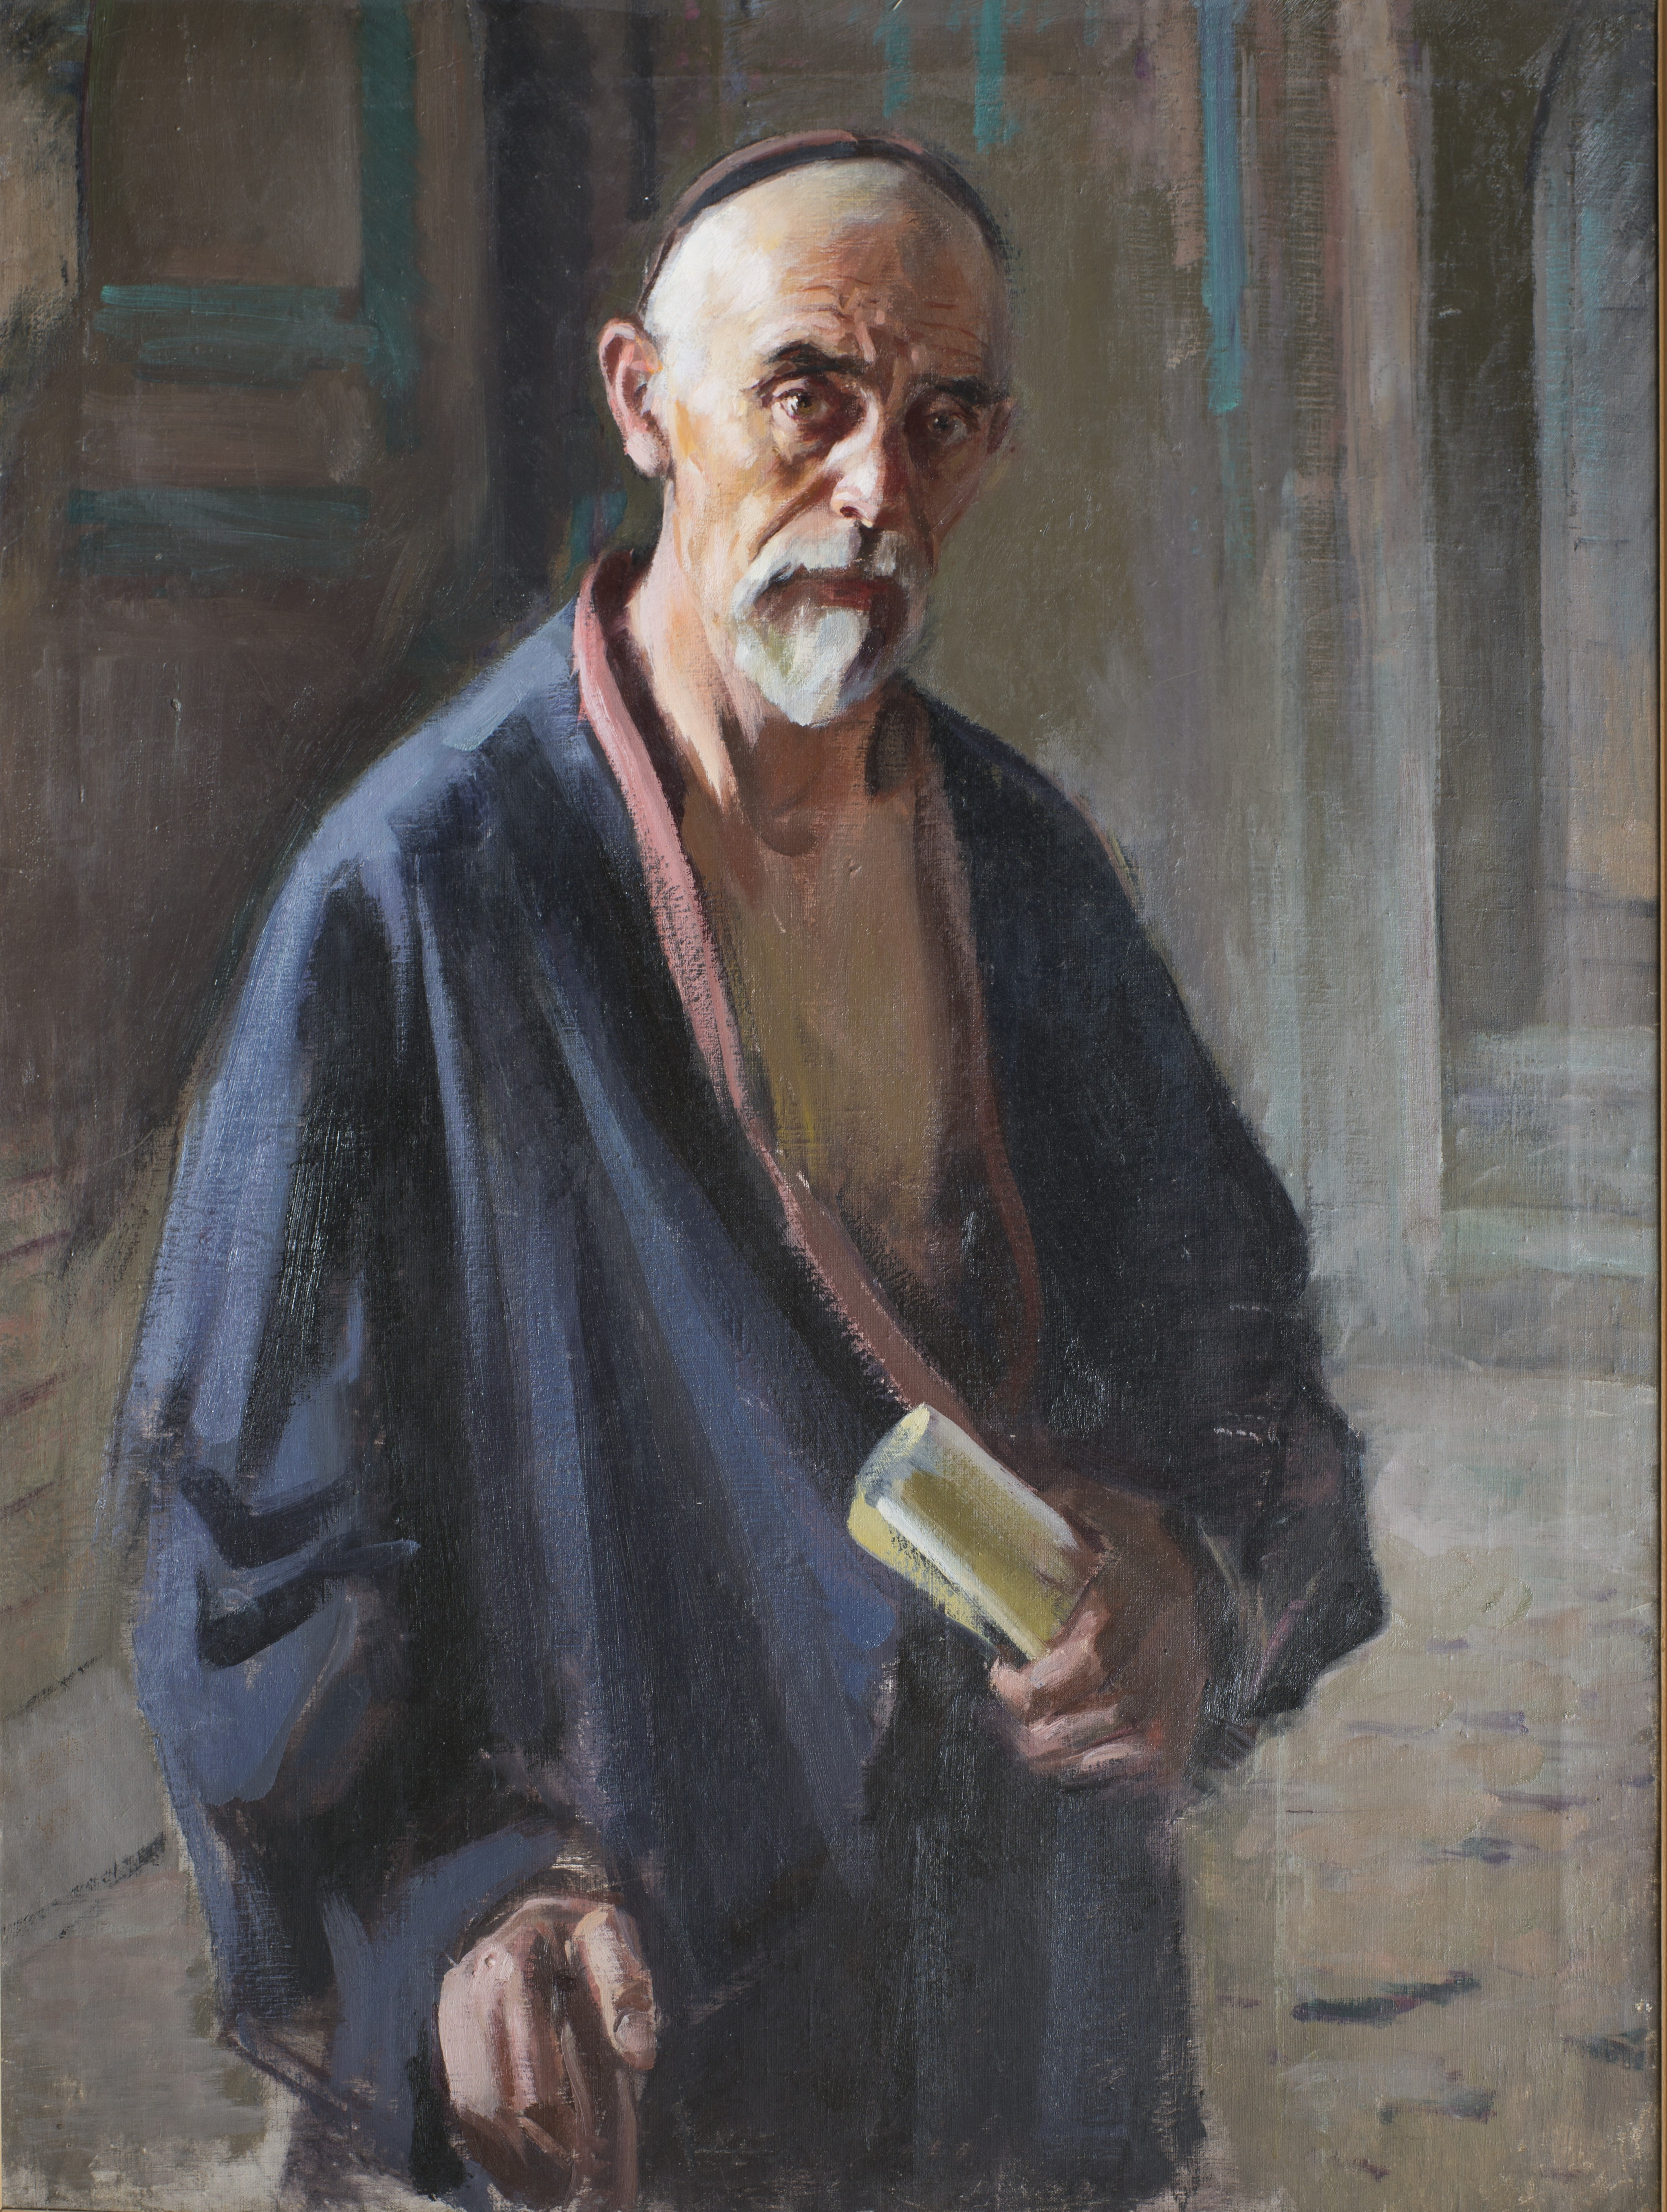 П. Беньков. Портрет старика (со свитком в руке). 1940-1945. Х., м. 127х95 см.jpg